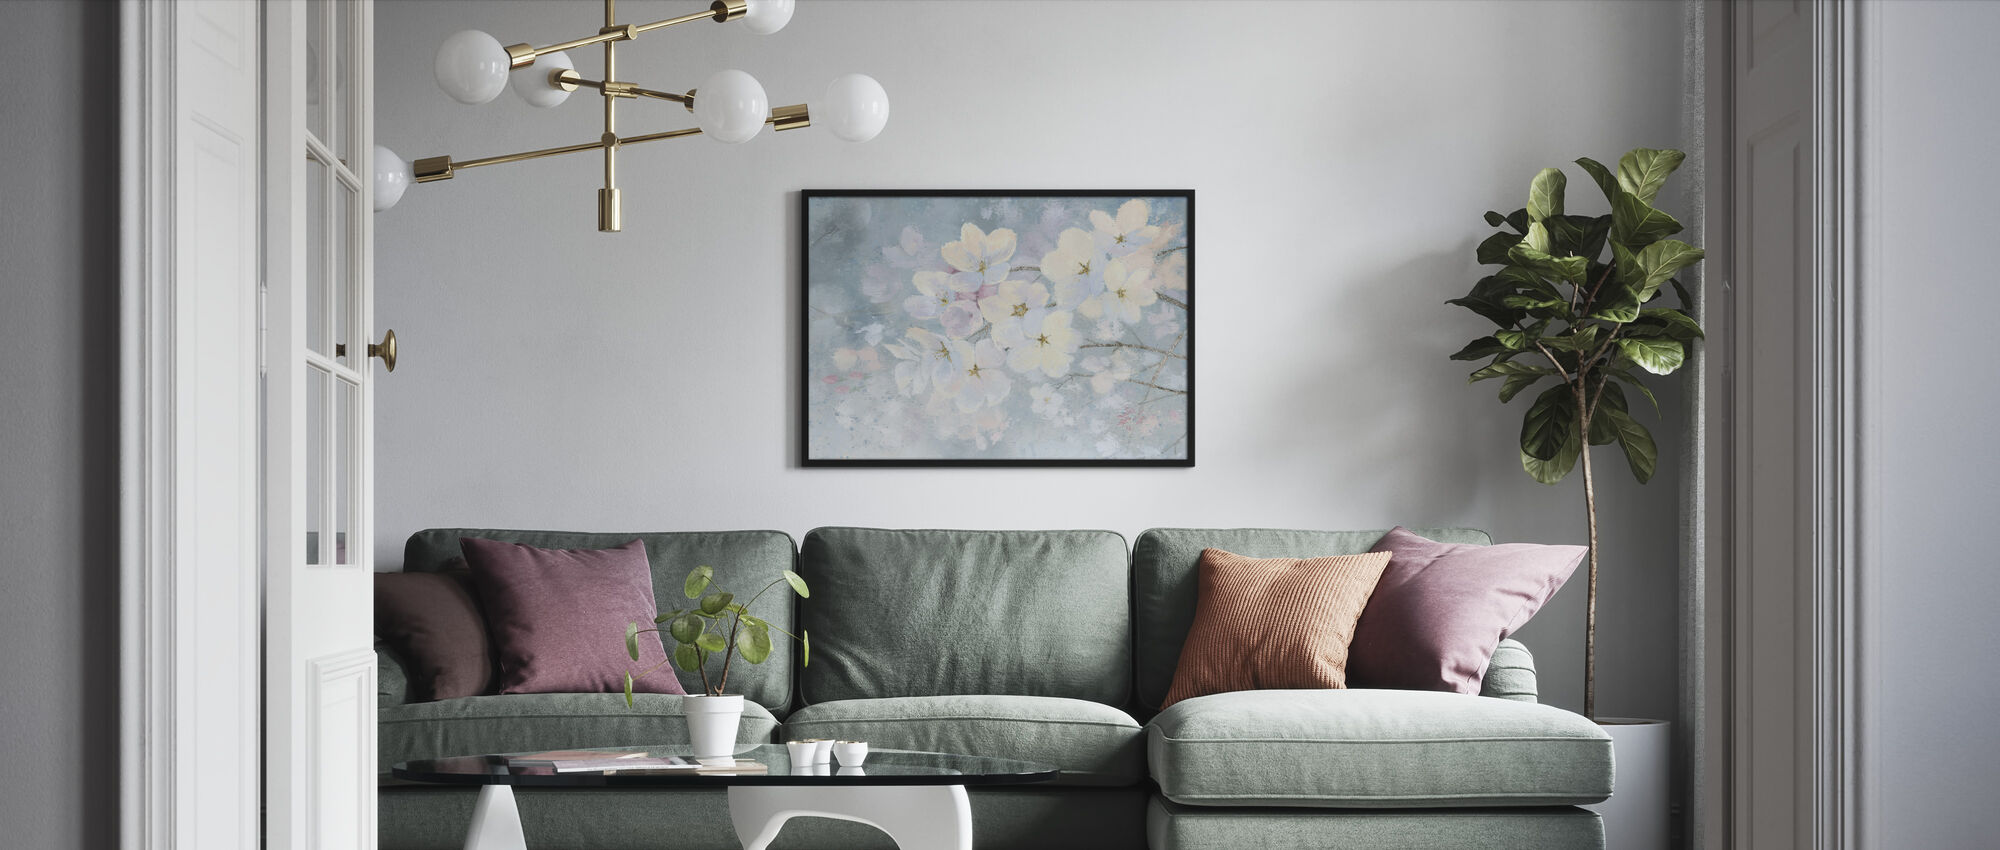 Prachtige Bloei - Ingelijste print - Woonkamer